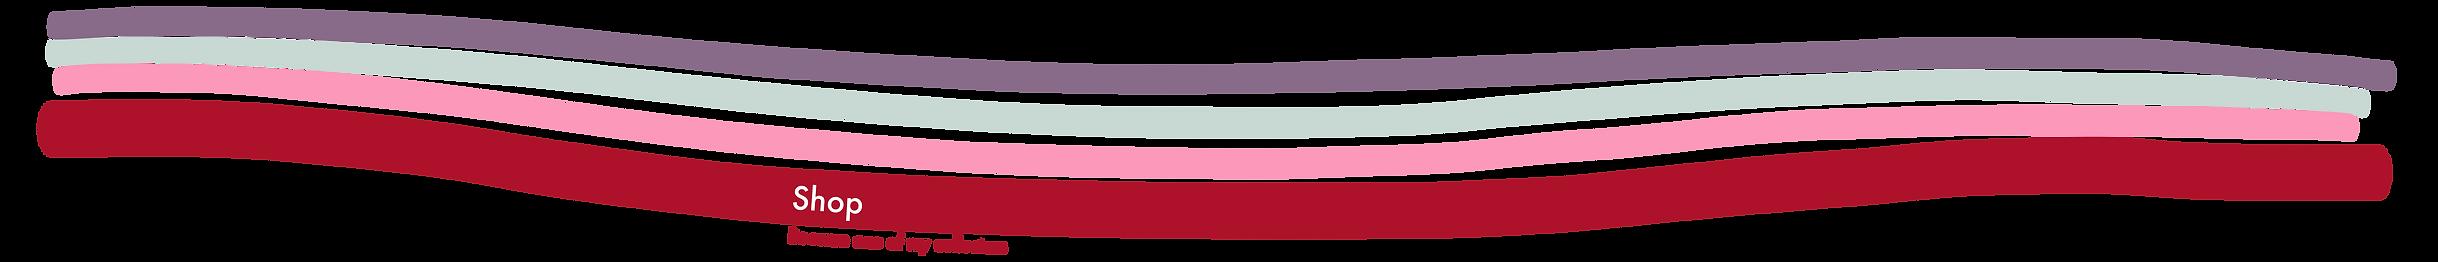 Graphisme lignes-Shop-01.png